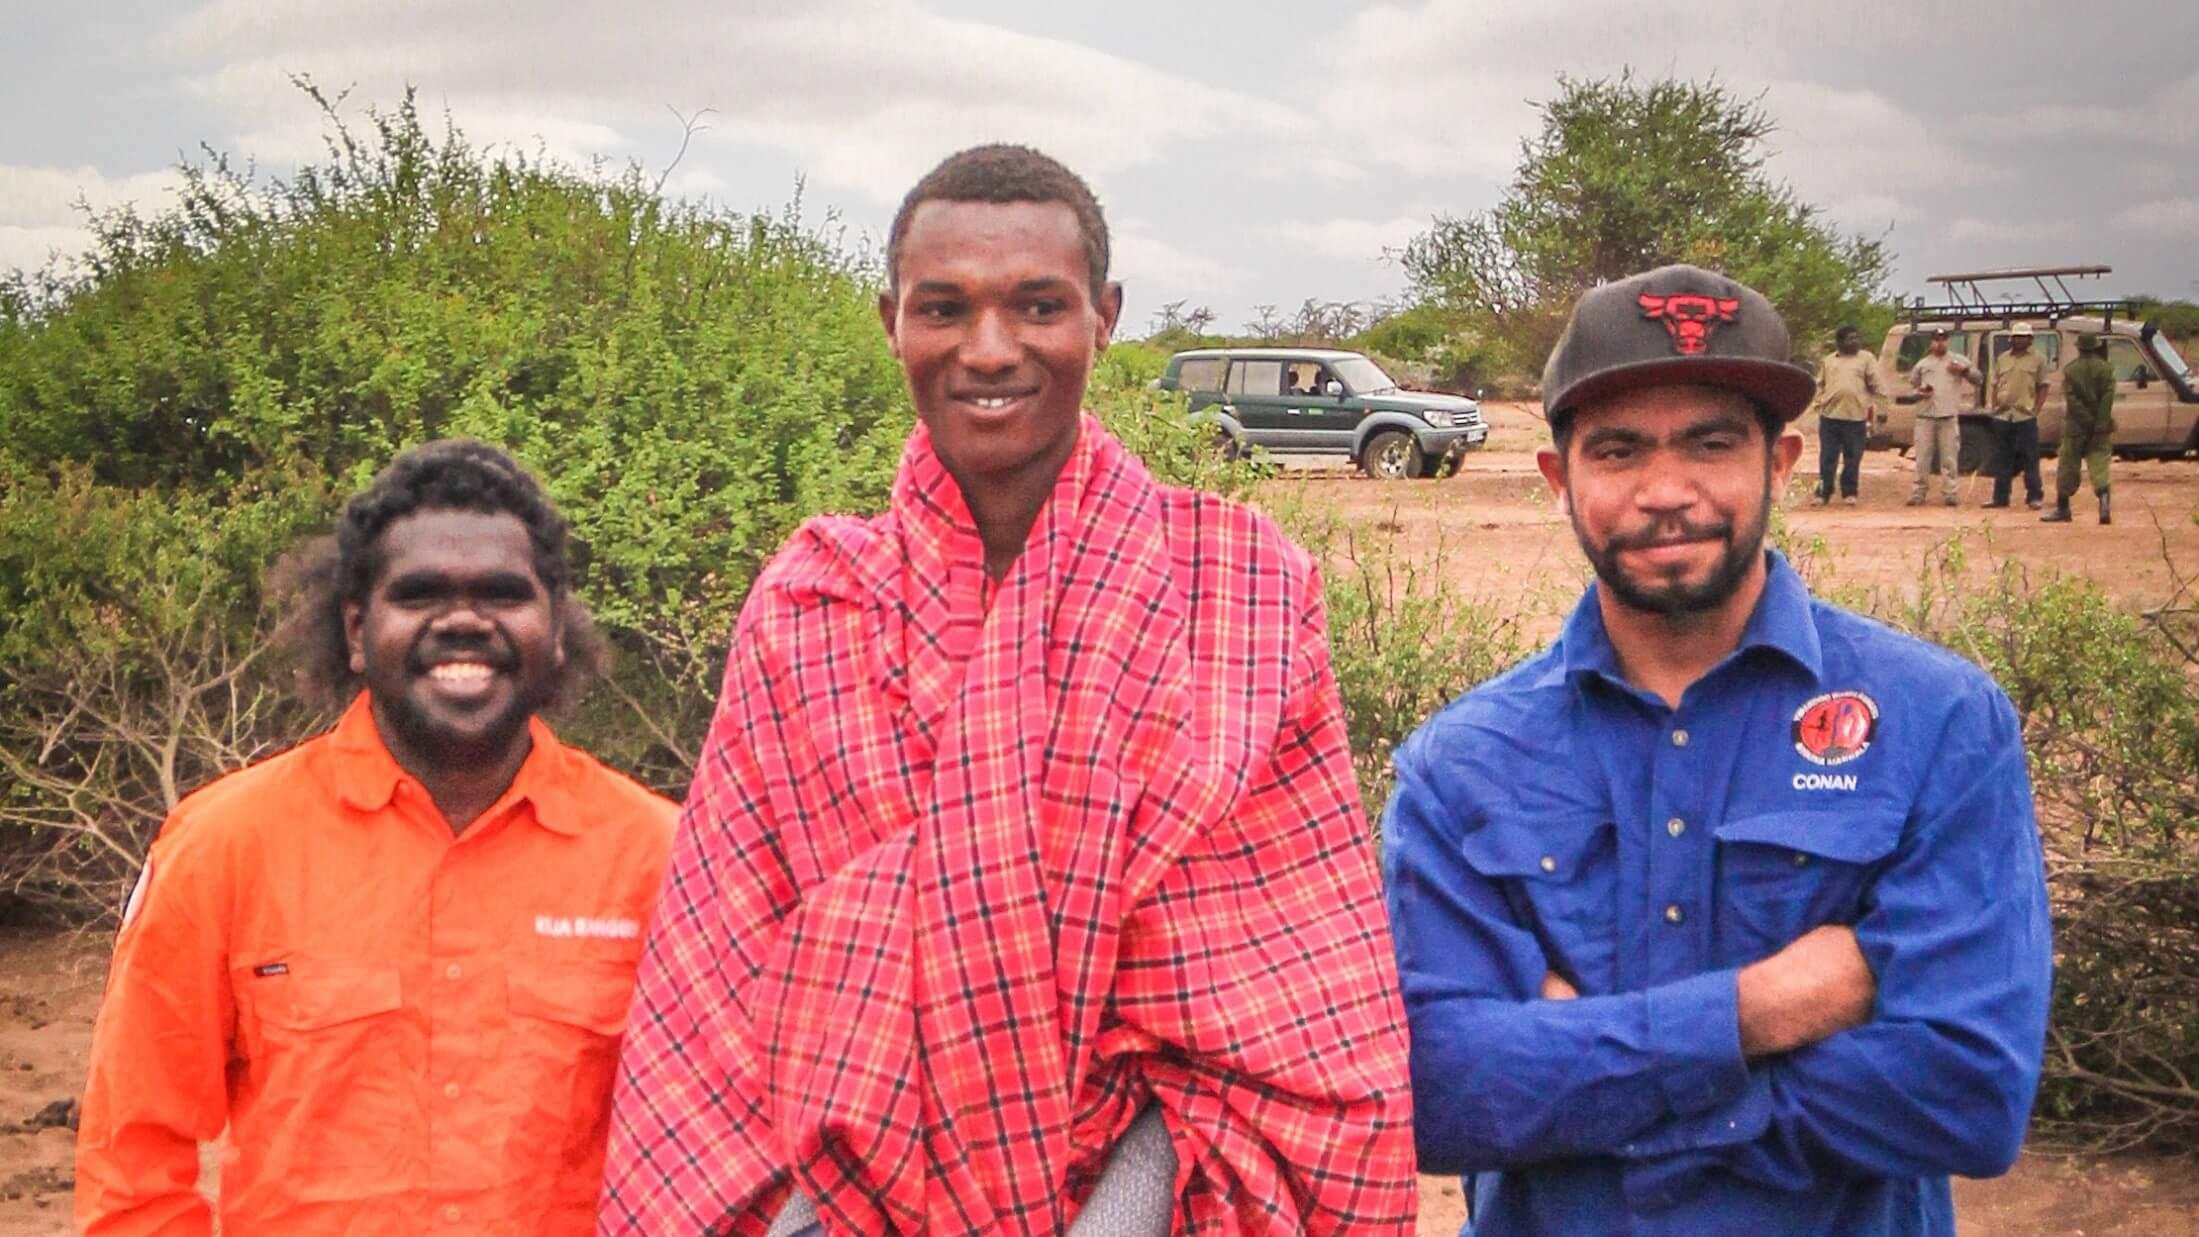 Imran and Conan with Maasai herdsman (1) (1).jpg